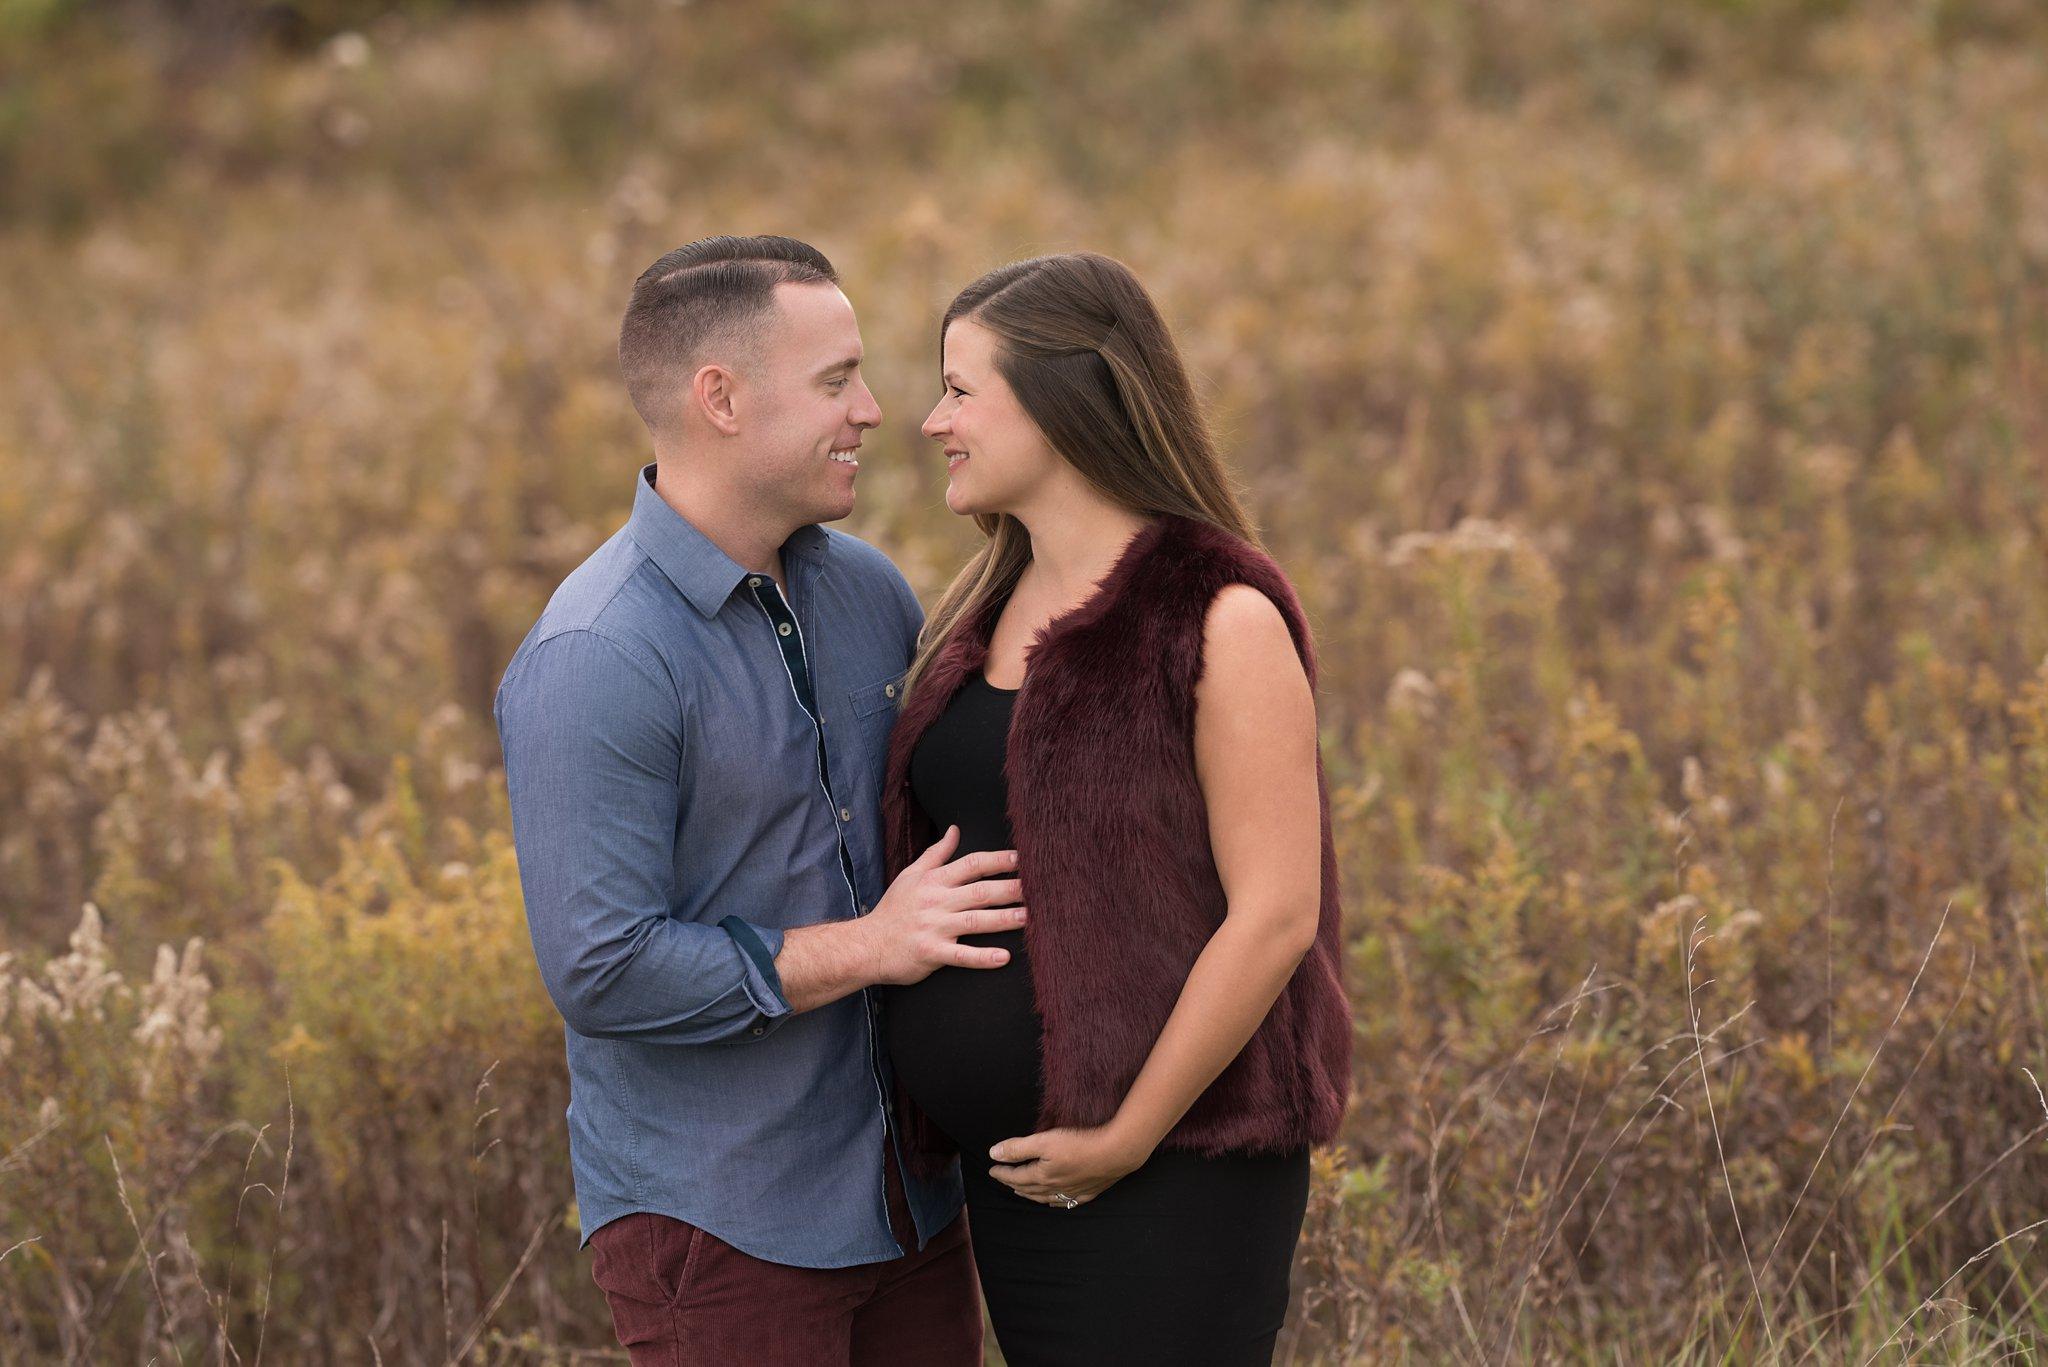 maternityphotographer-columbusohio-pregnancyphotography-jacquelinemariephotography-1.jpg